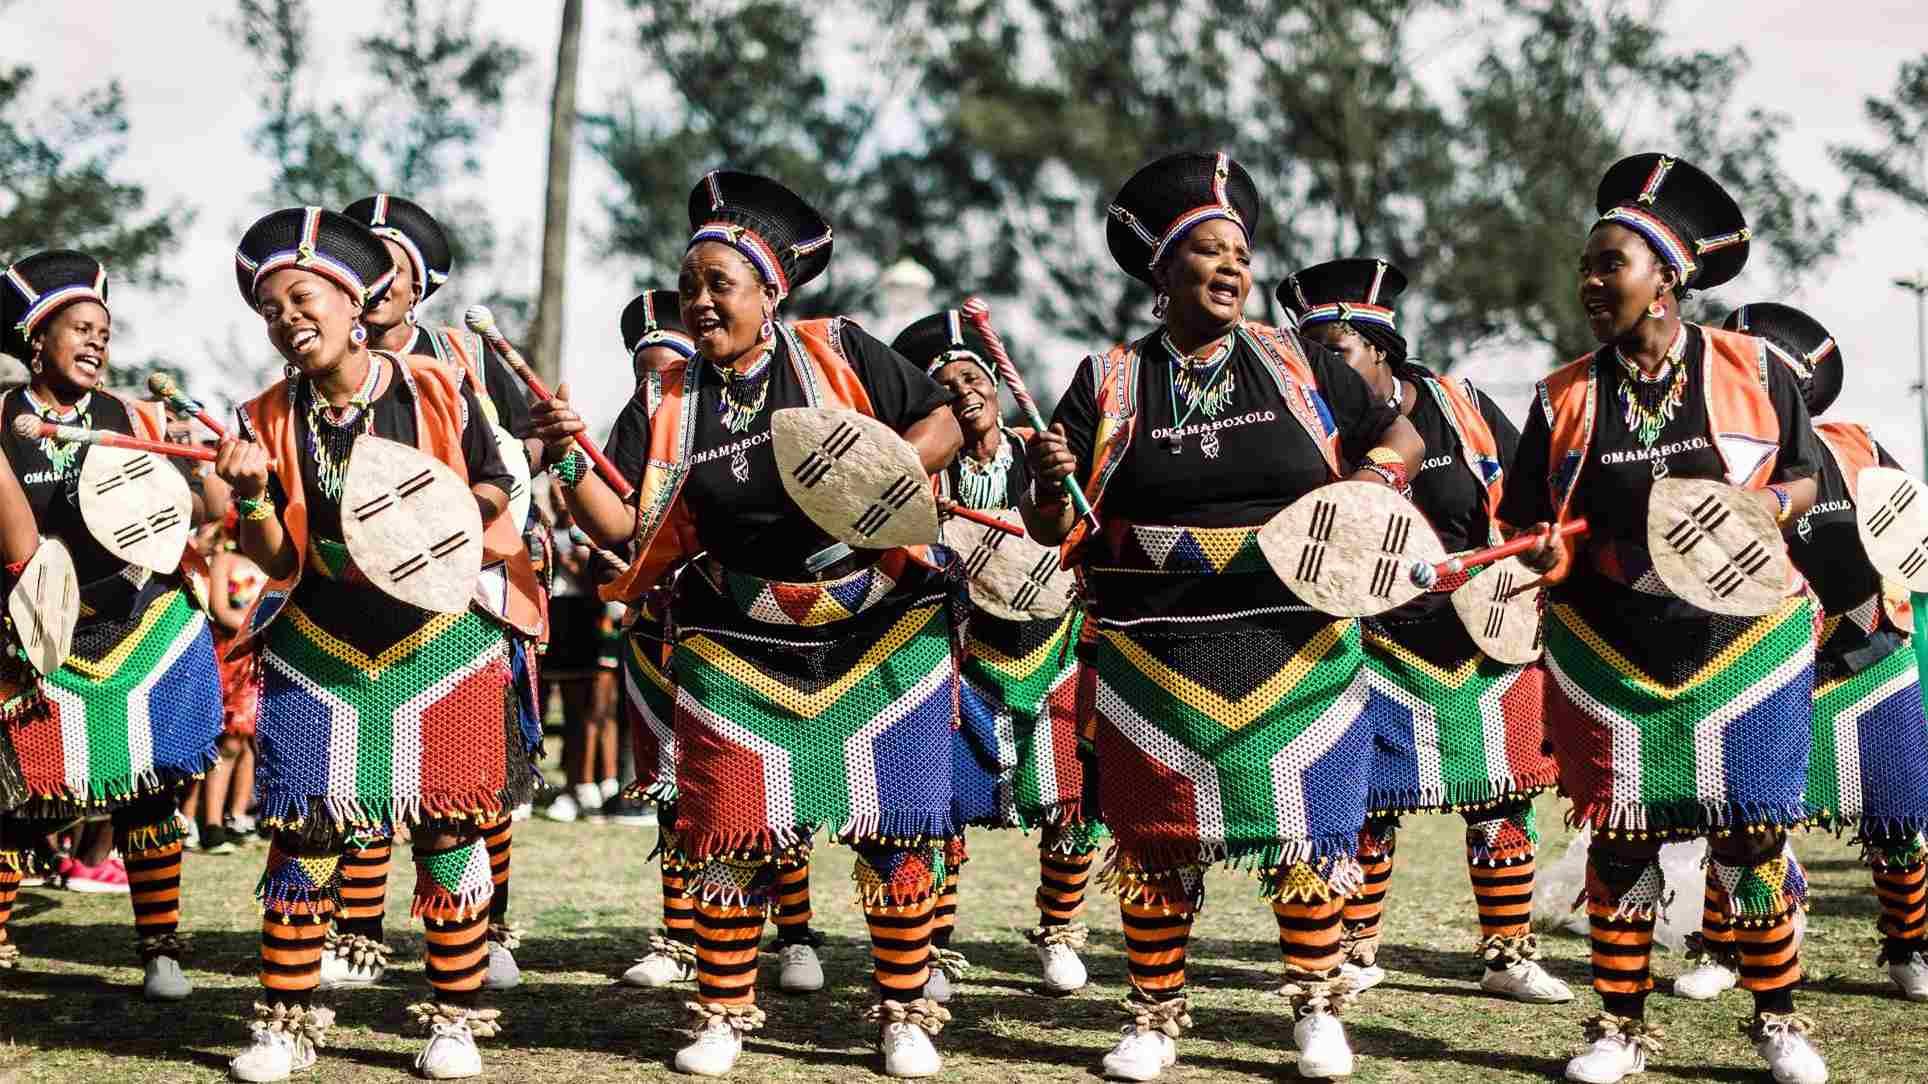 African music: Understanding culture through music